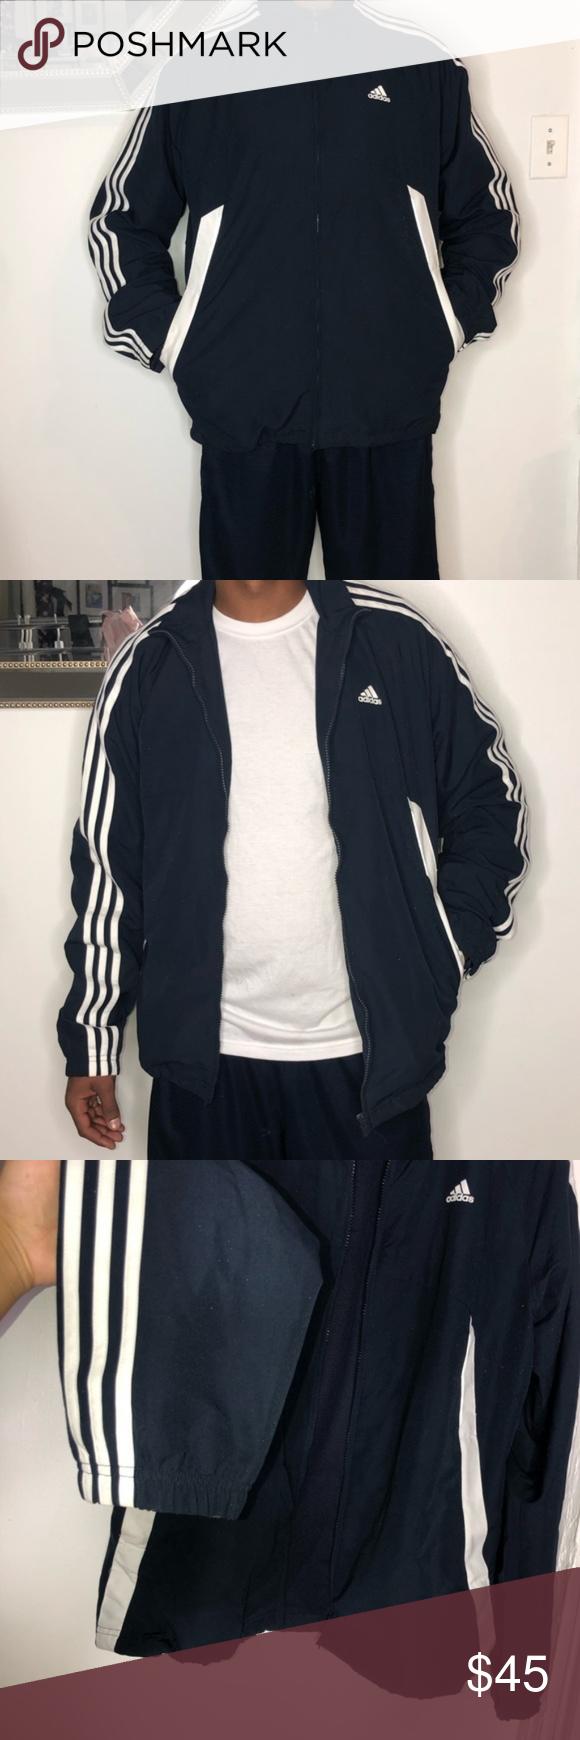 Adidas Men's Three Stripes Reflectors Jacket Vintage Men's